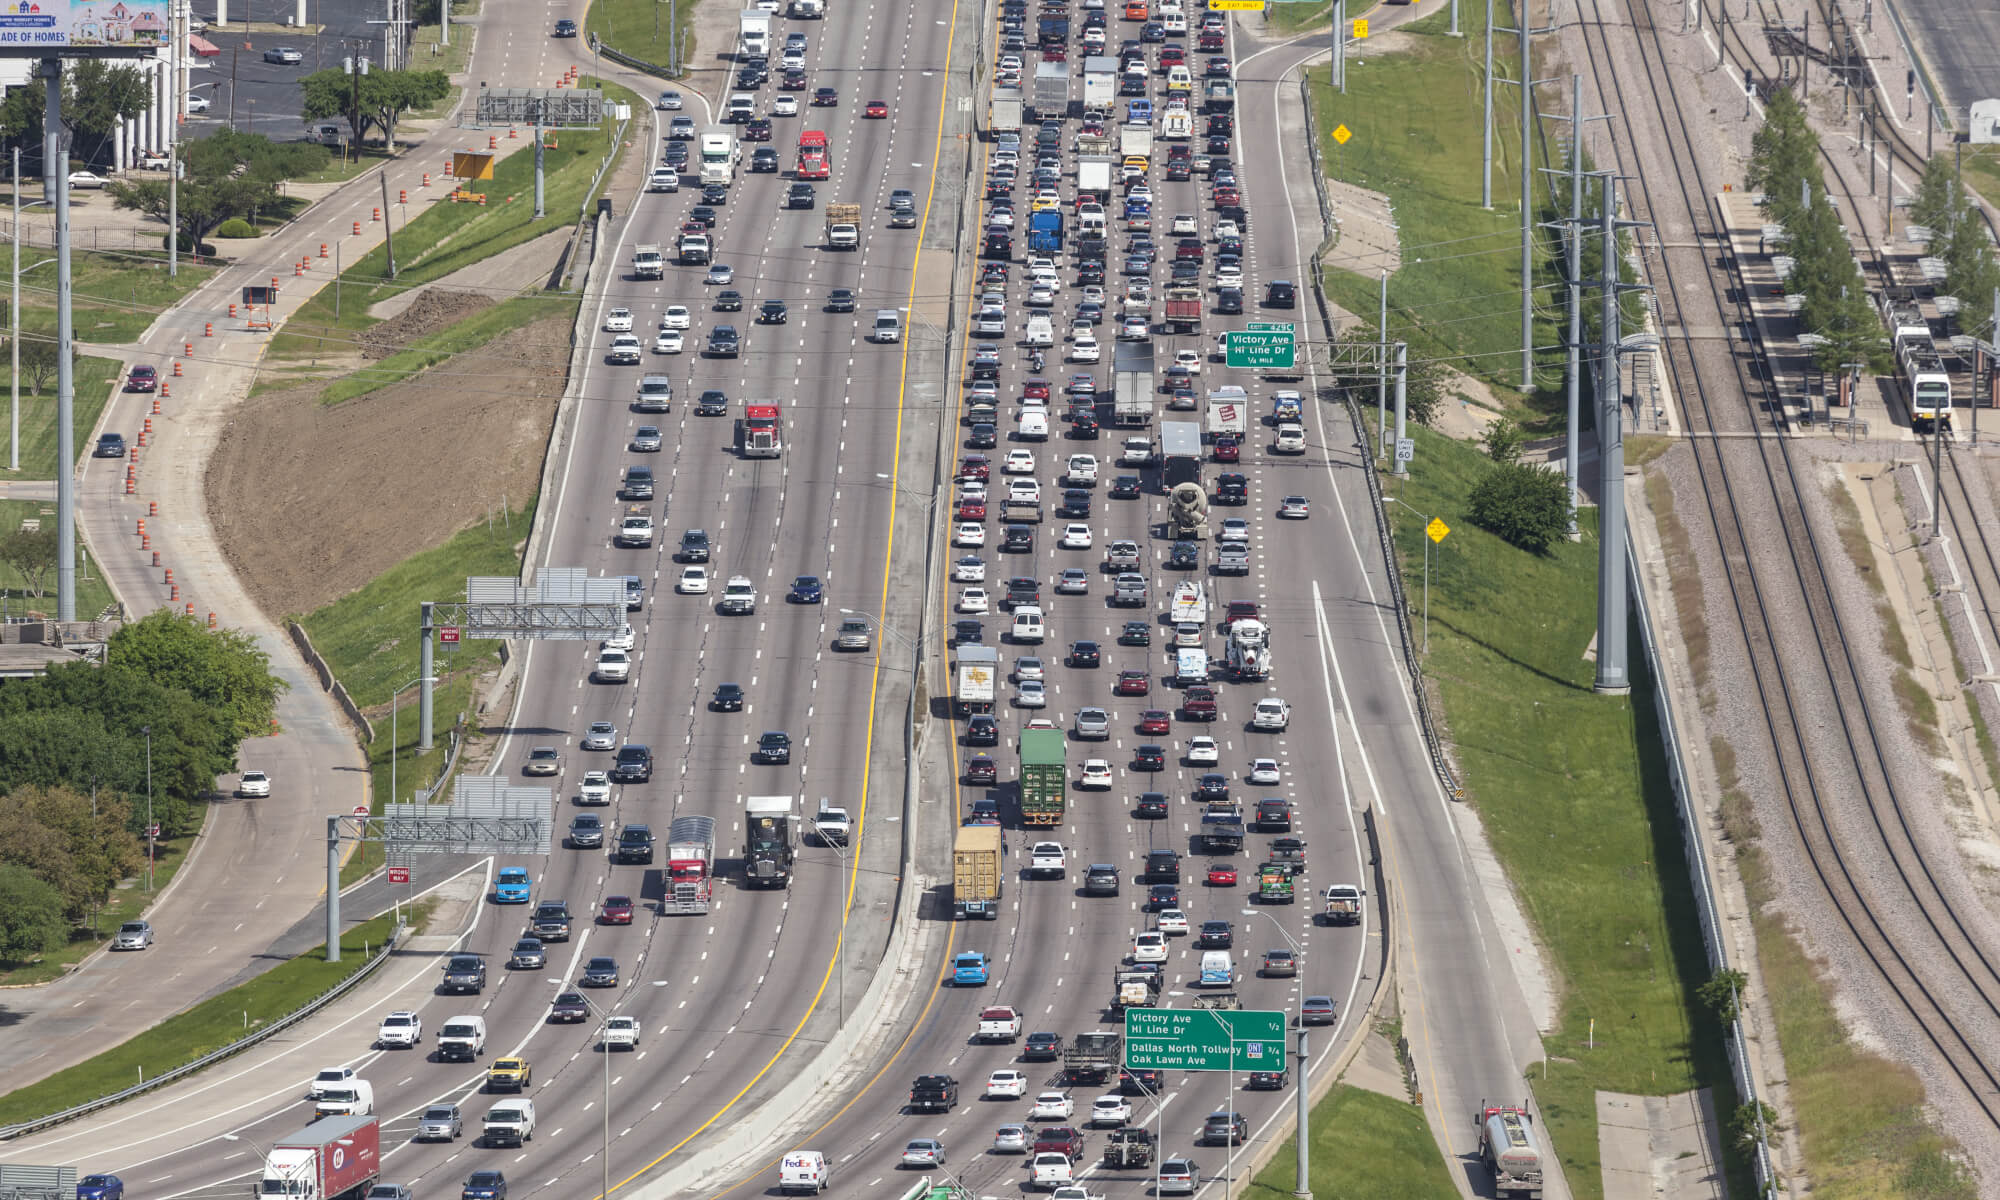 traffic jam in dallas, texas